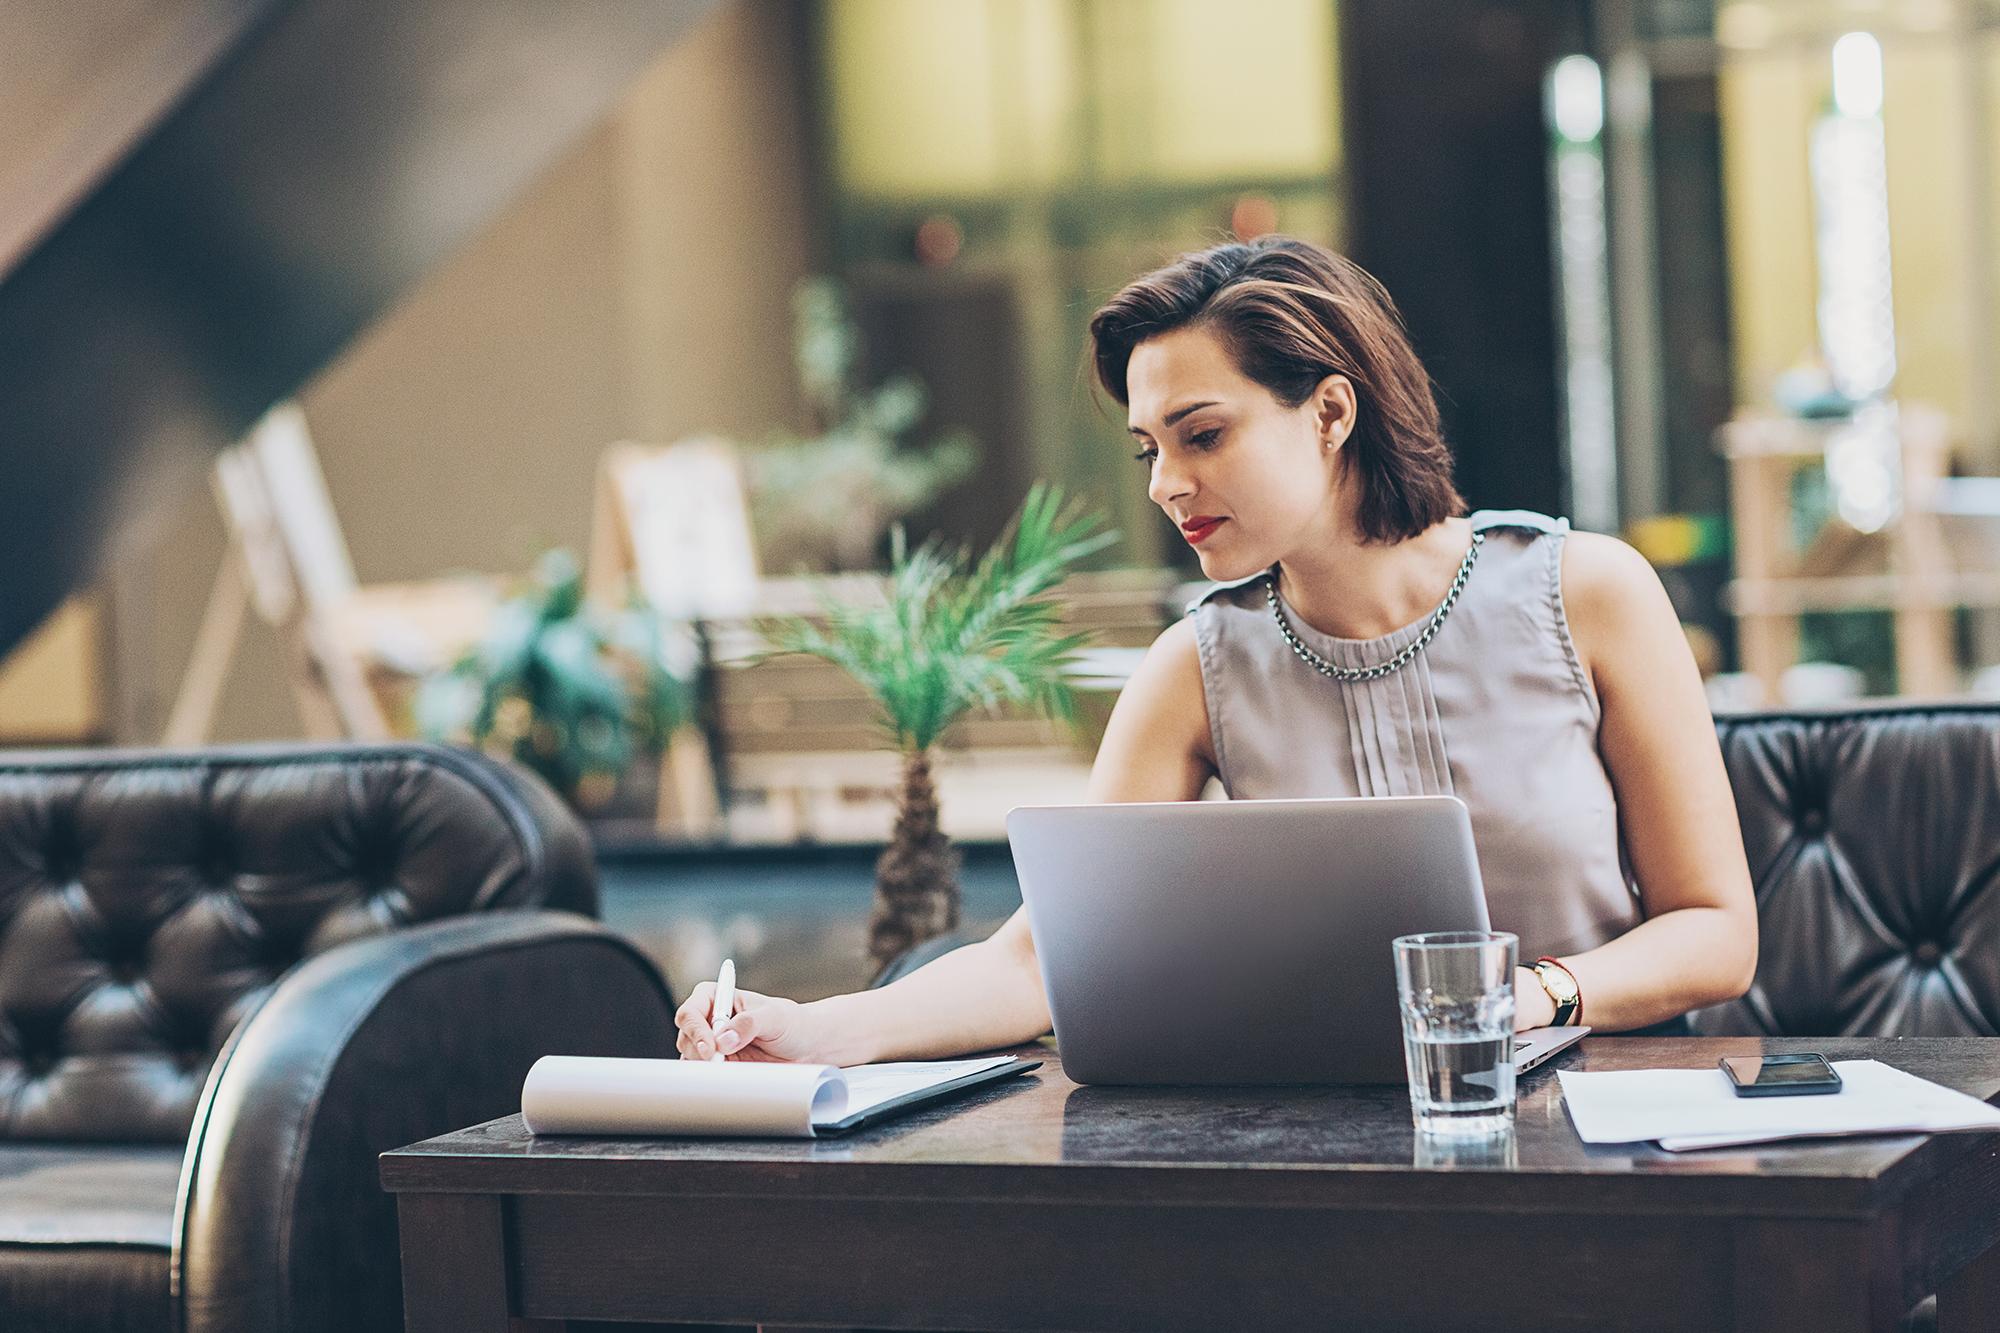 Businesswoman writing documents